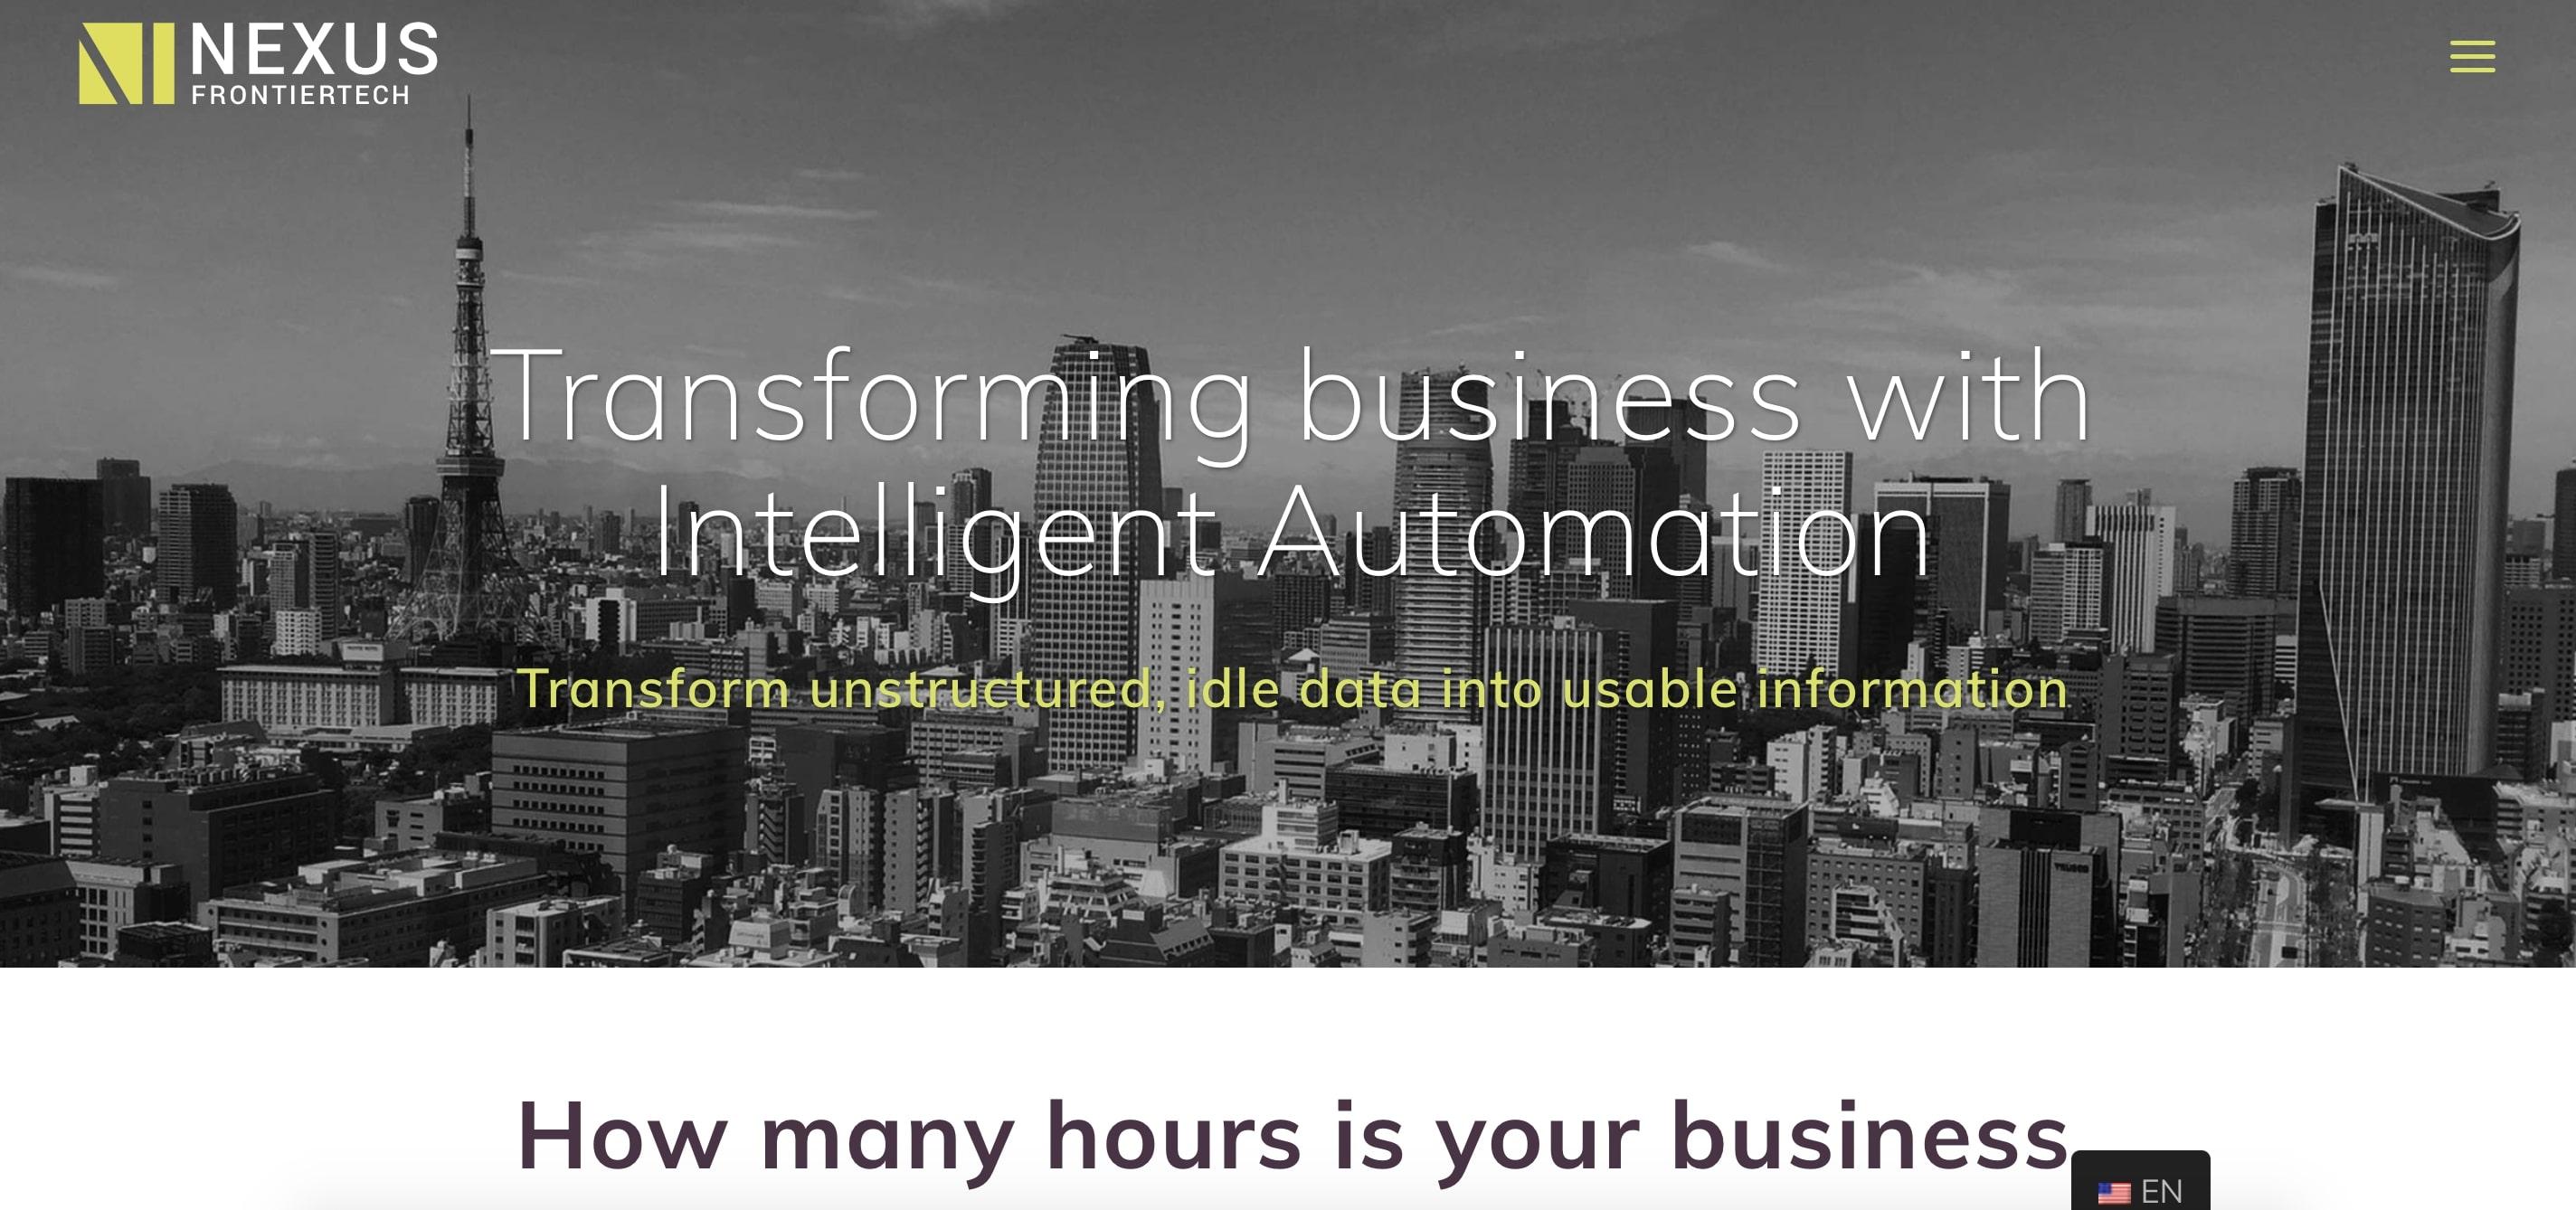 Nexus Frontier Tech AI company website homepage